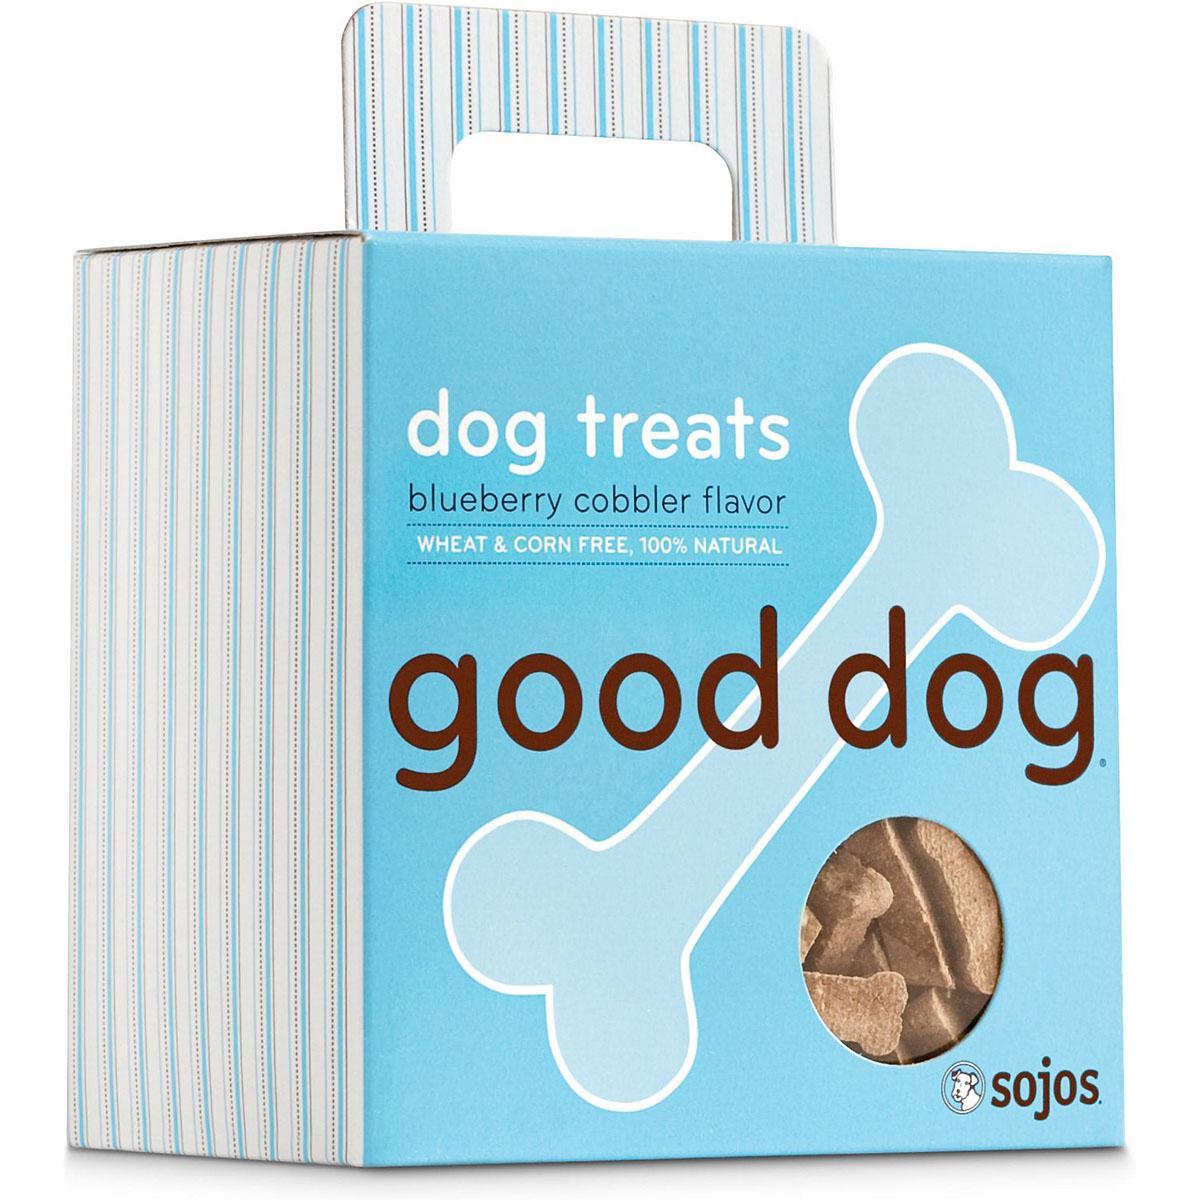 Sojos Good Dog Blueberry Cobbler Dog Treats